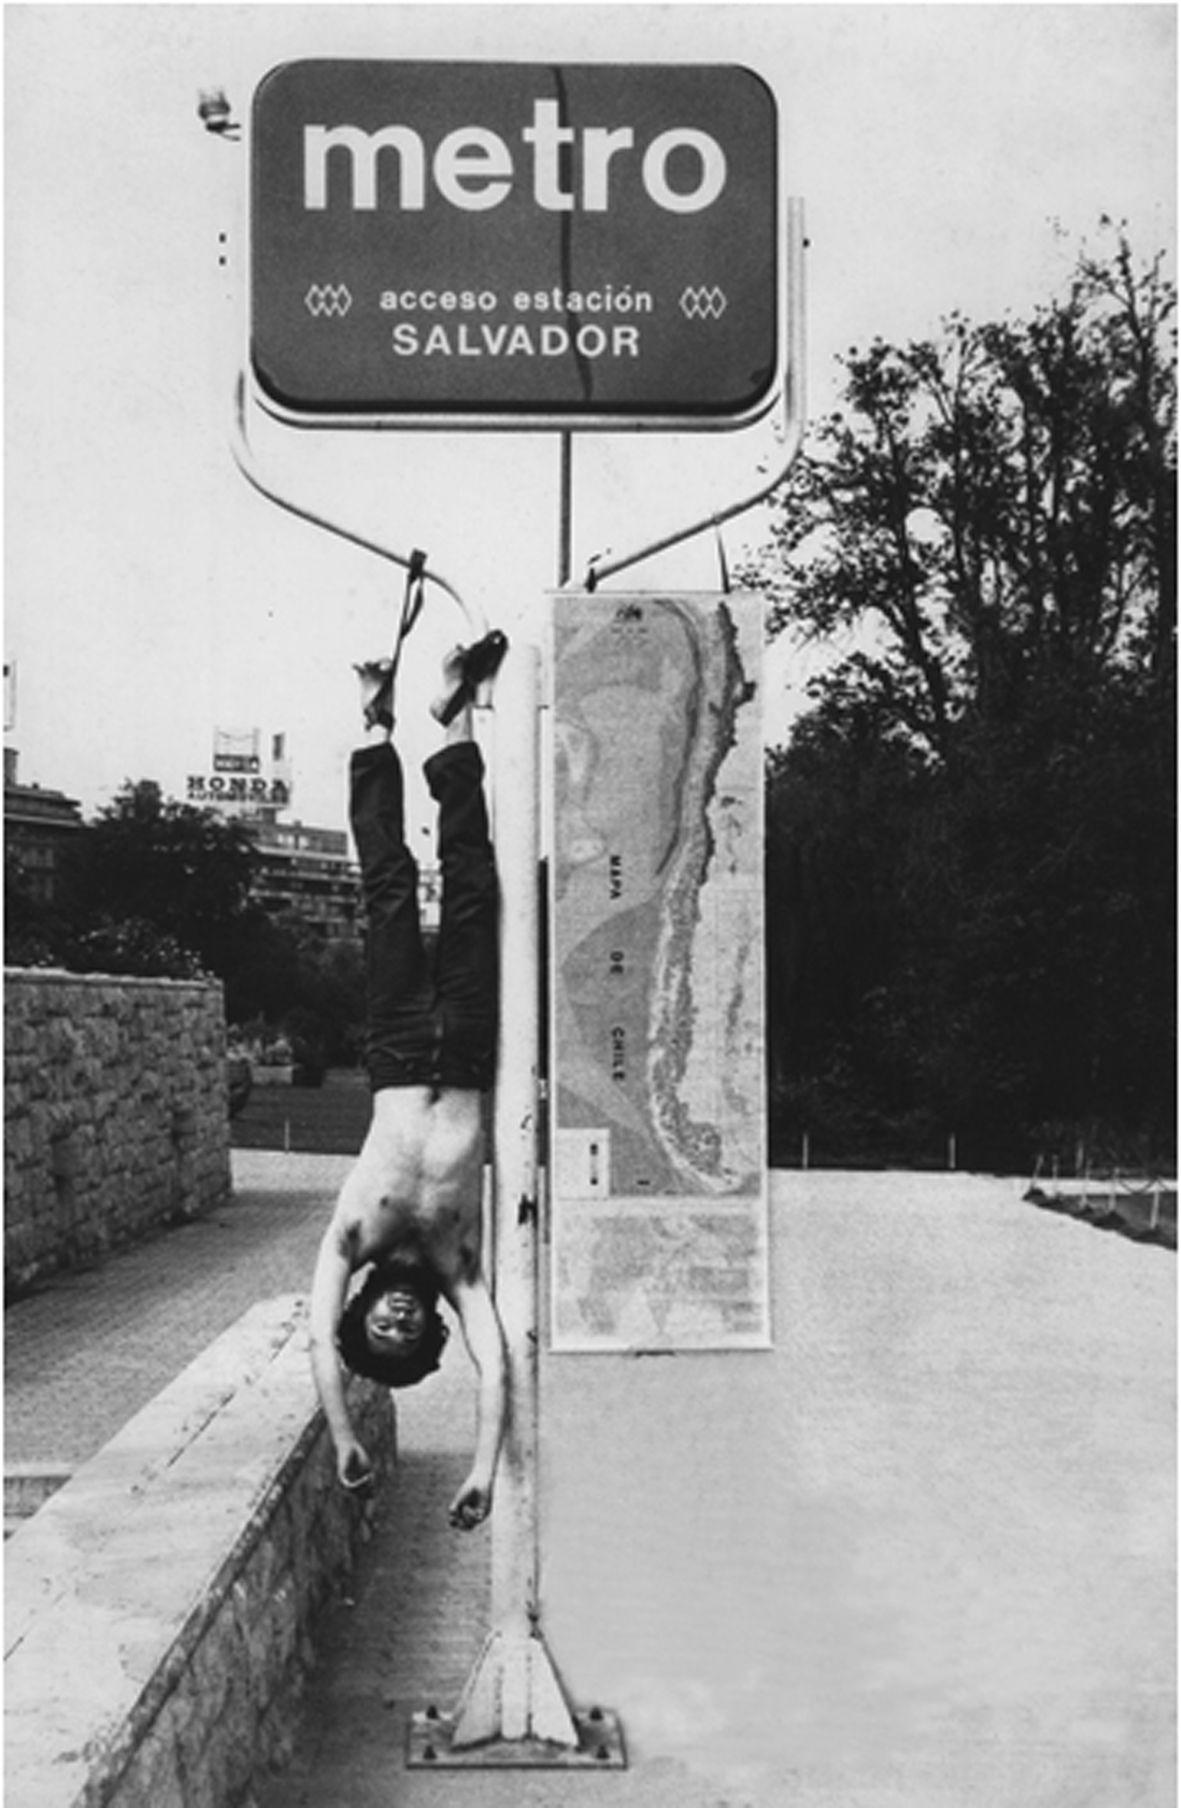 Elías Adasme,A Chile -Intervención corporal de un espacio público.Chile(1979-1980). Courtesy of the artist.